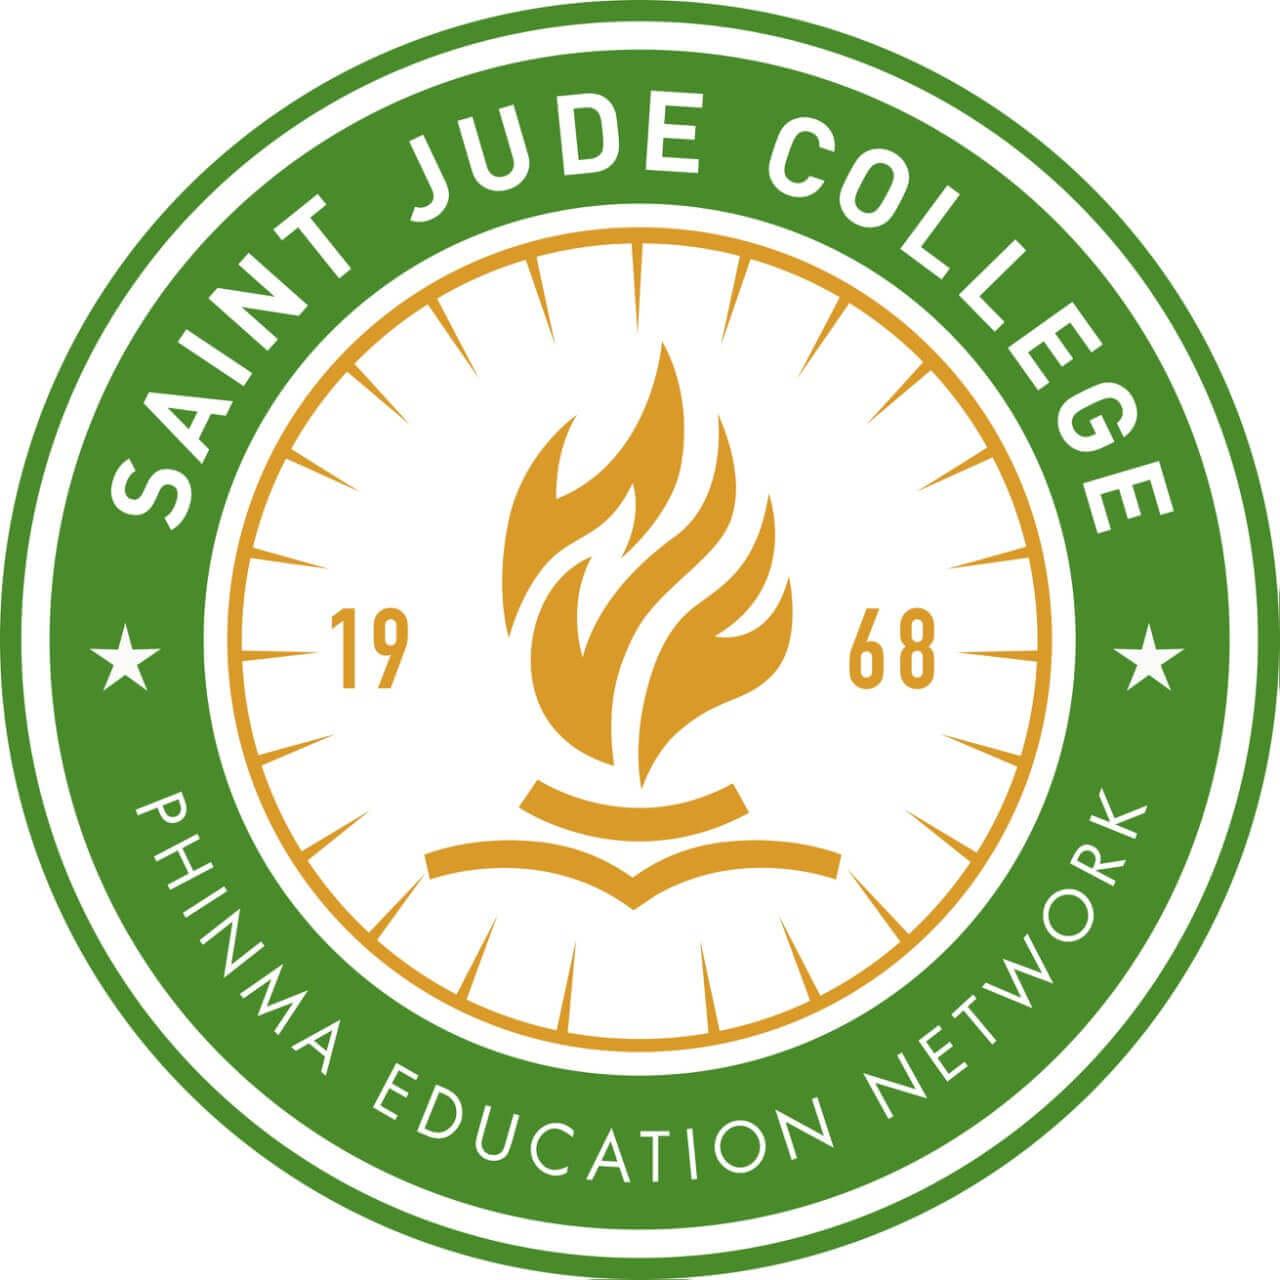 Sjc phinma new logo 2